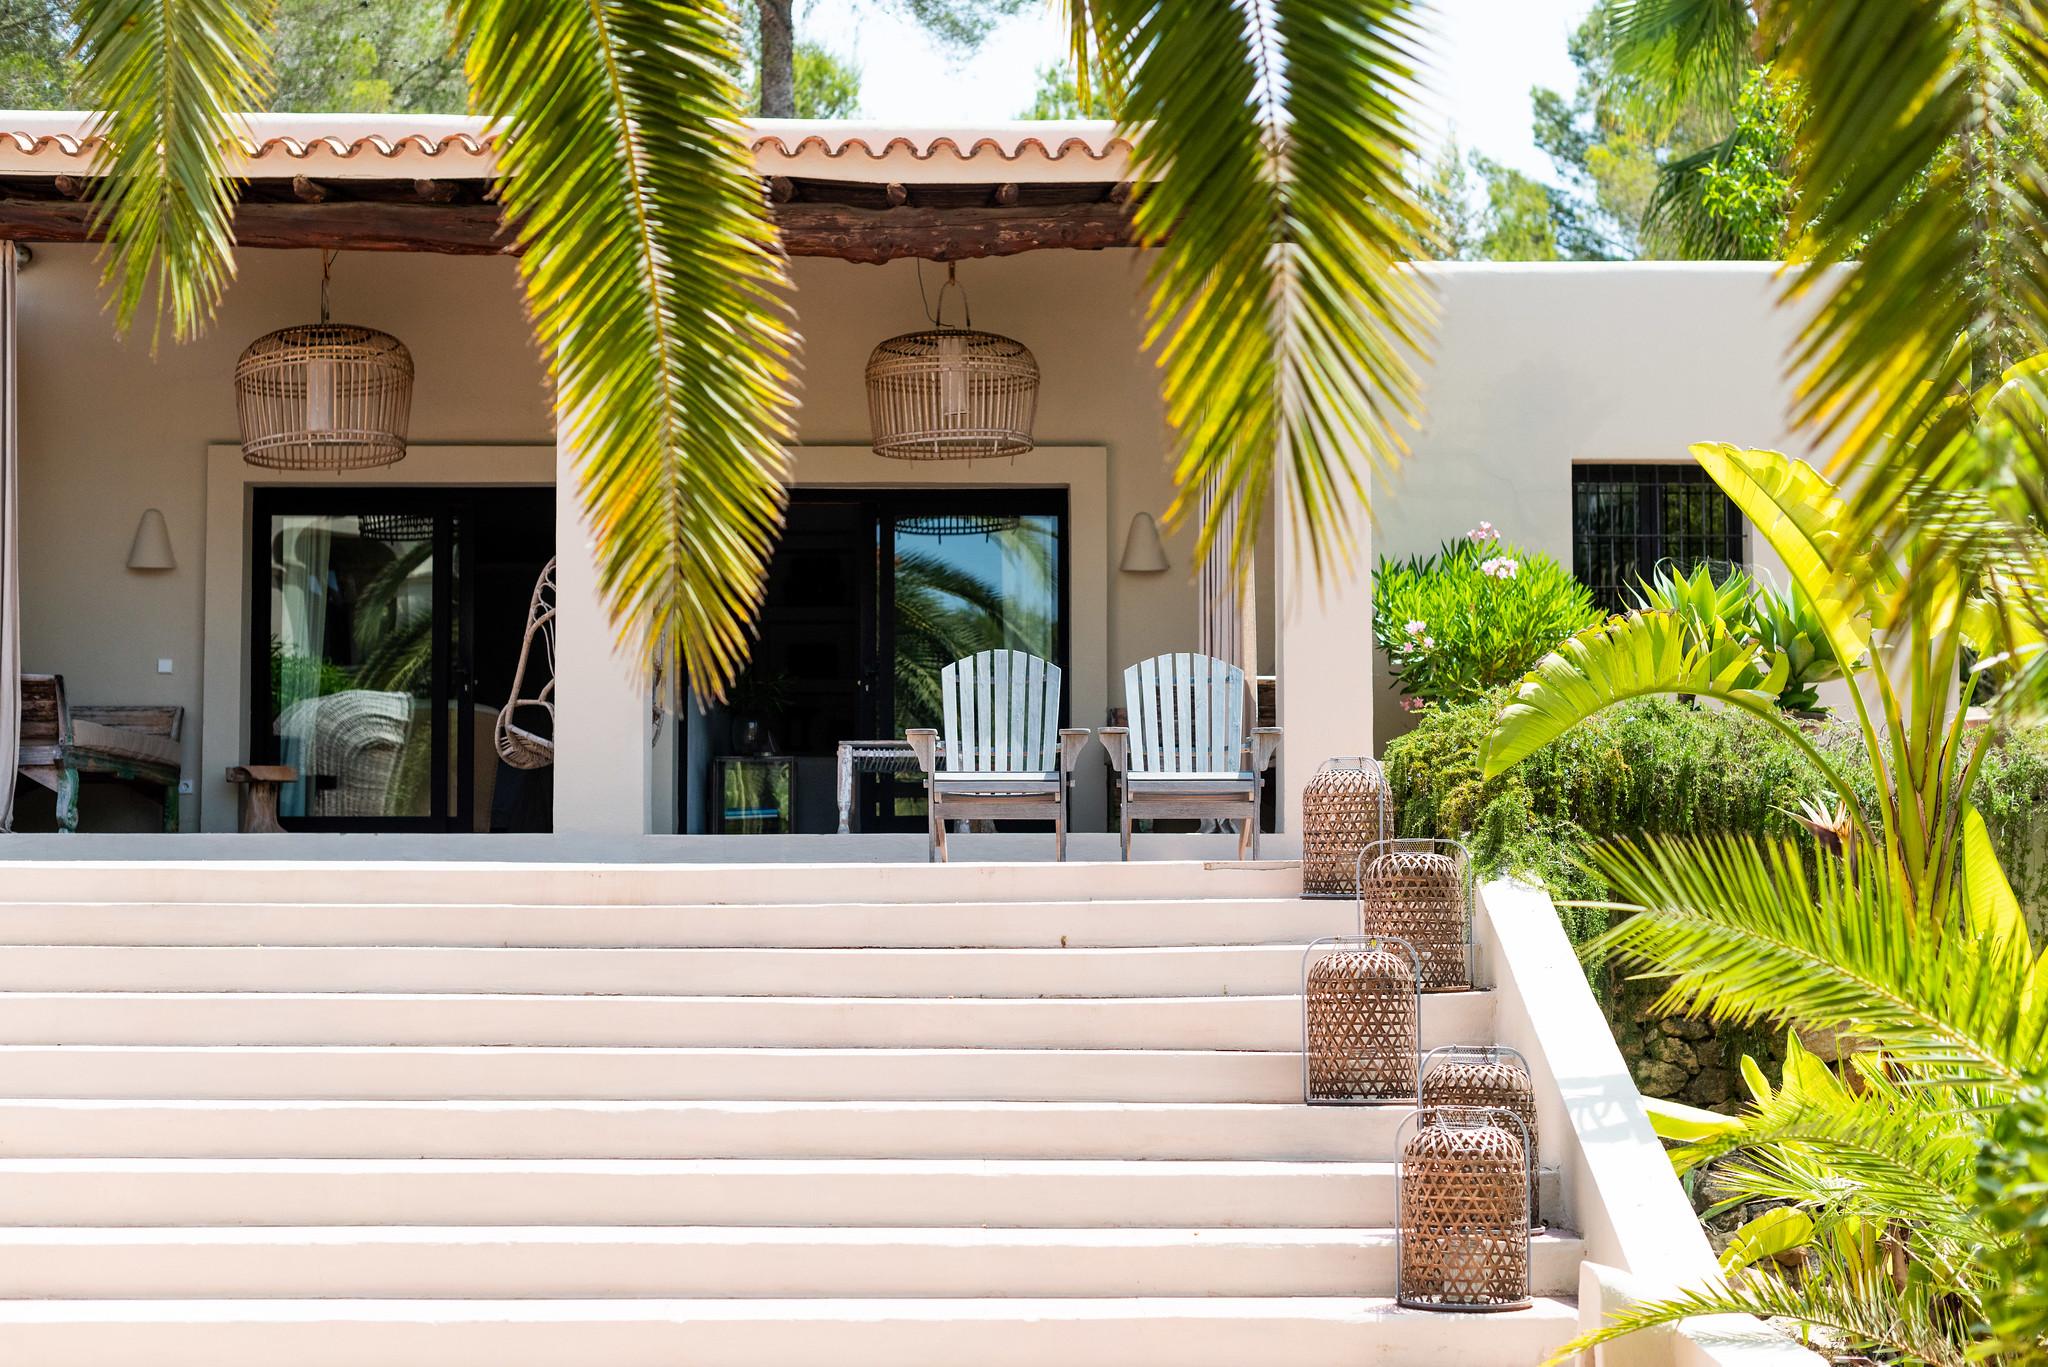 https://www.white-ibiza.com/wp-content/uploads/2020/05/white-ibiza-villas-can-riviere-exterior-casita-steps.jpg